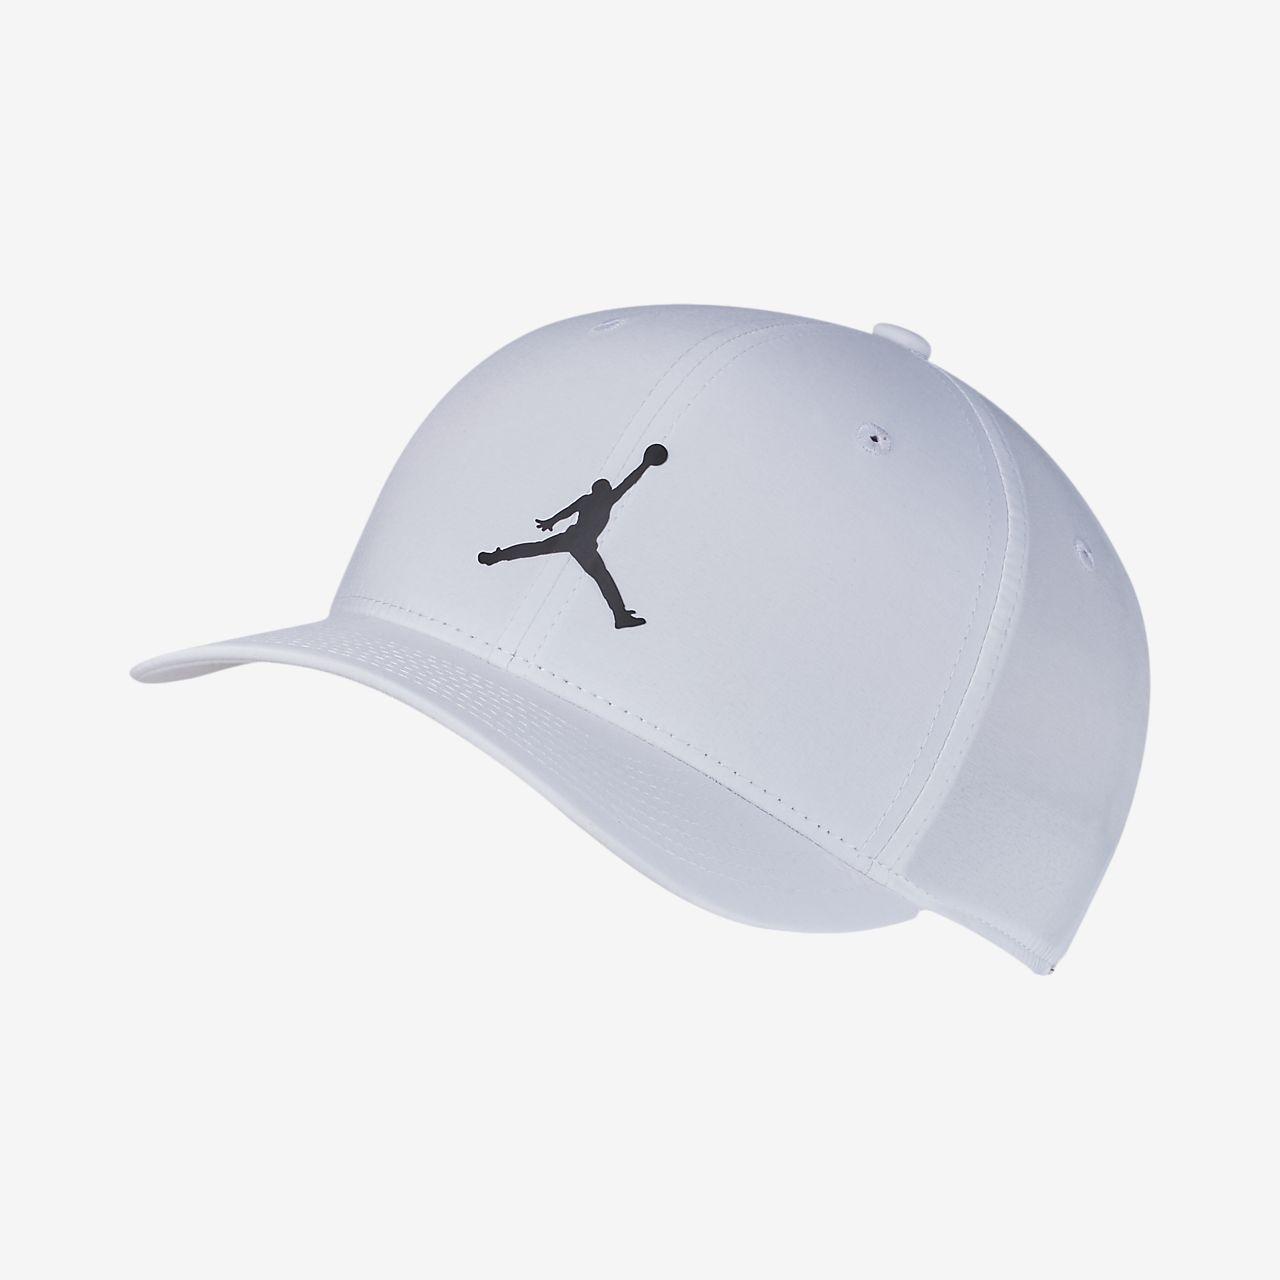 bda3b5be9d9 Jordan Classic99 Men s Snapback Hat. Nike.com IN